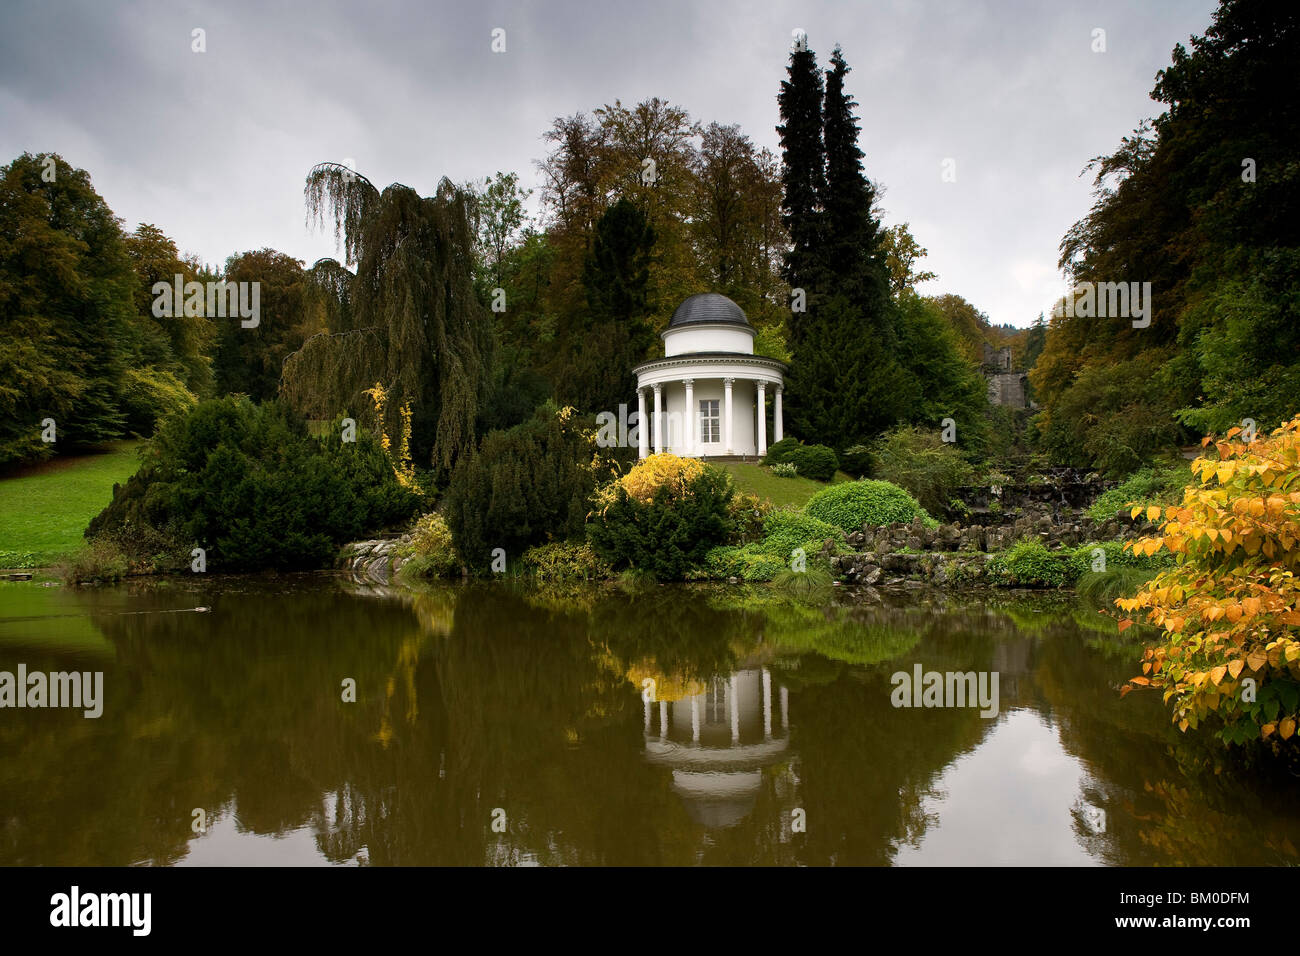 Apollo Temple in Bergpark Wilhelmshoehe, largest European hillside park, Kassel, Hesse, Germany, Europe - Stock Image